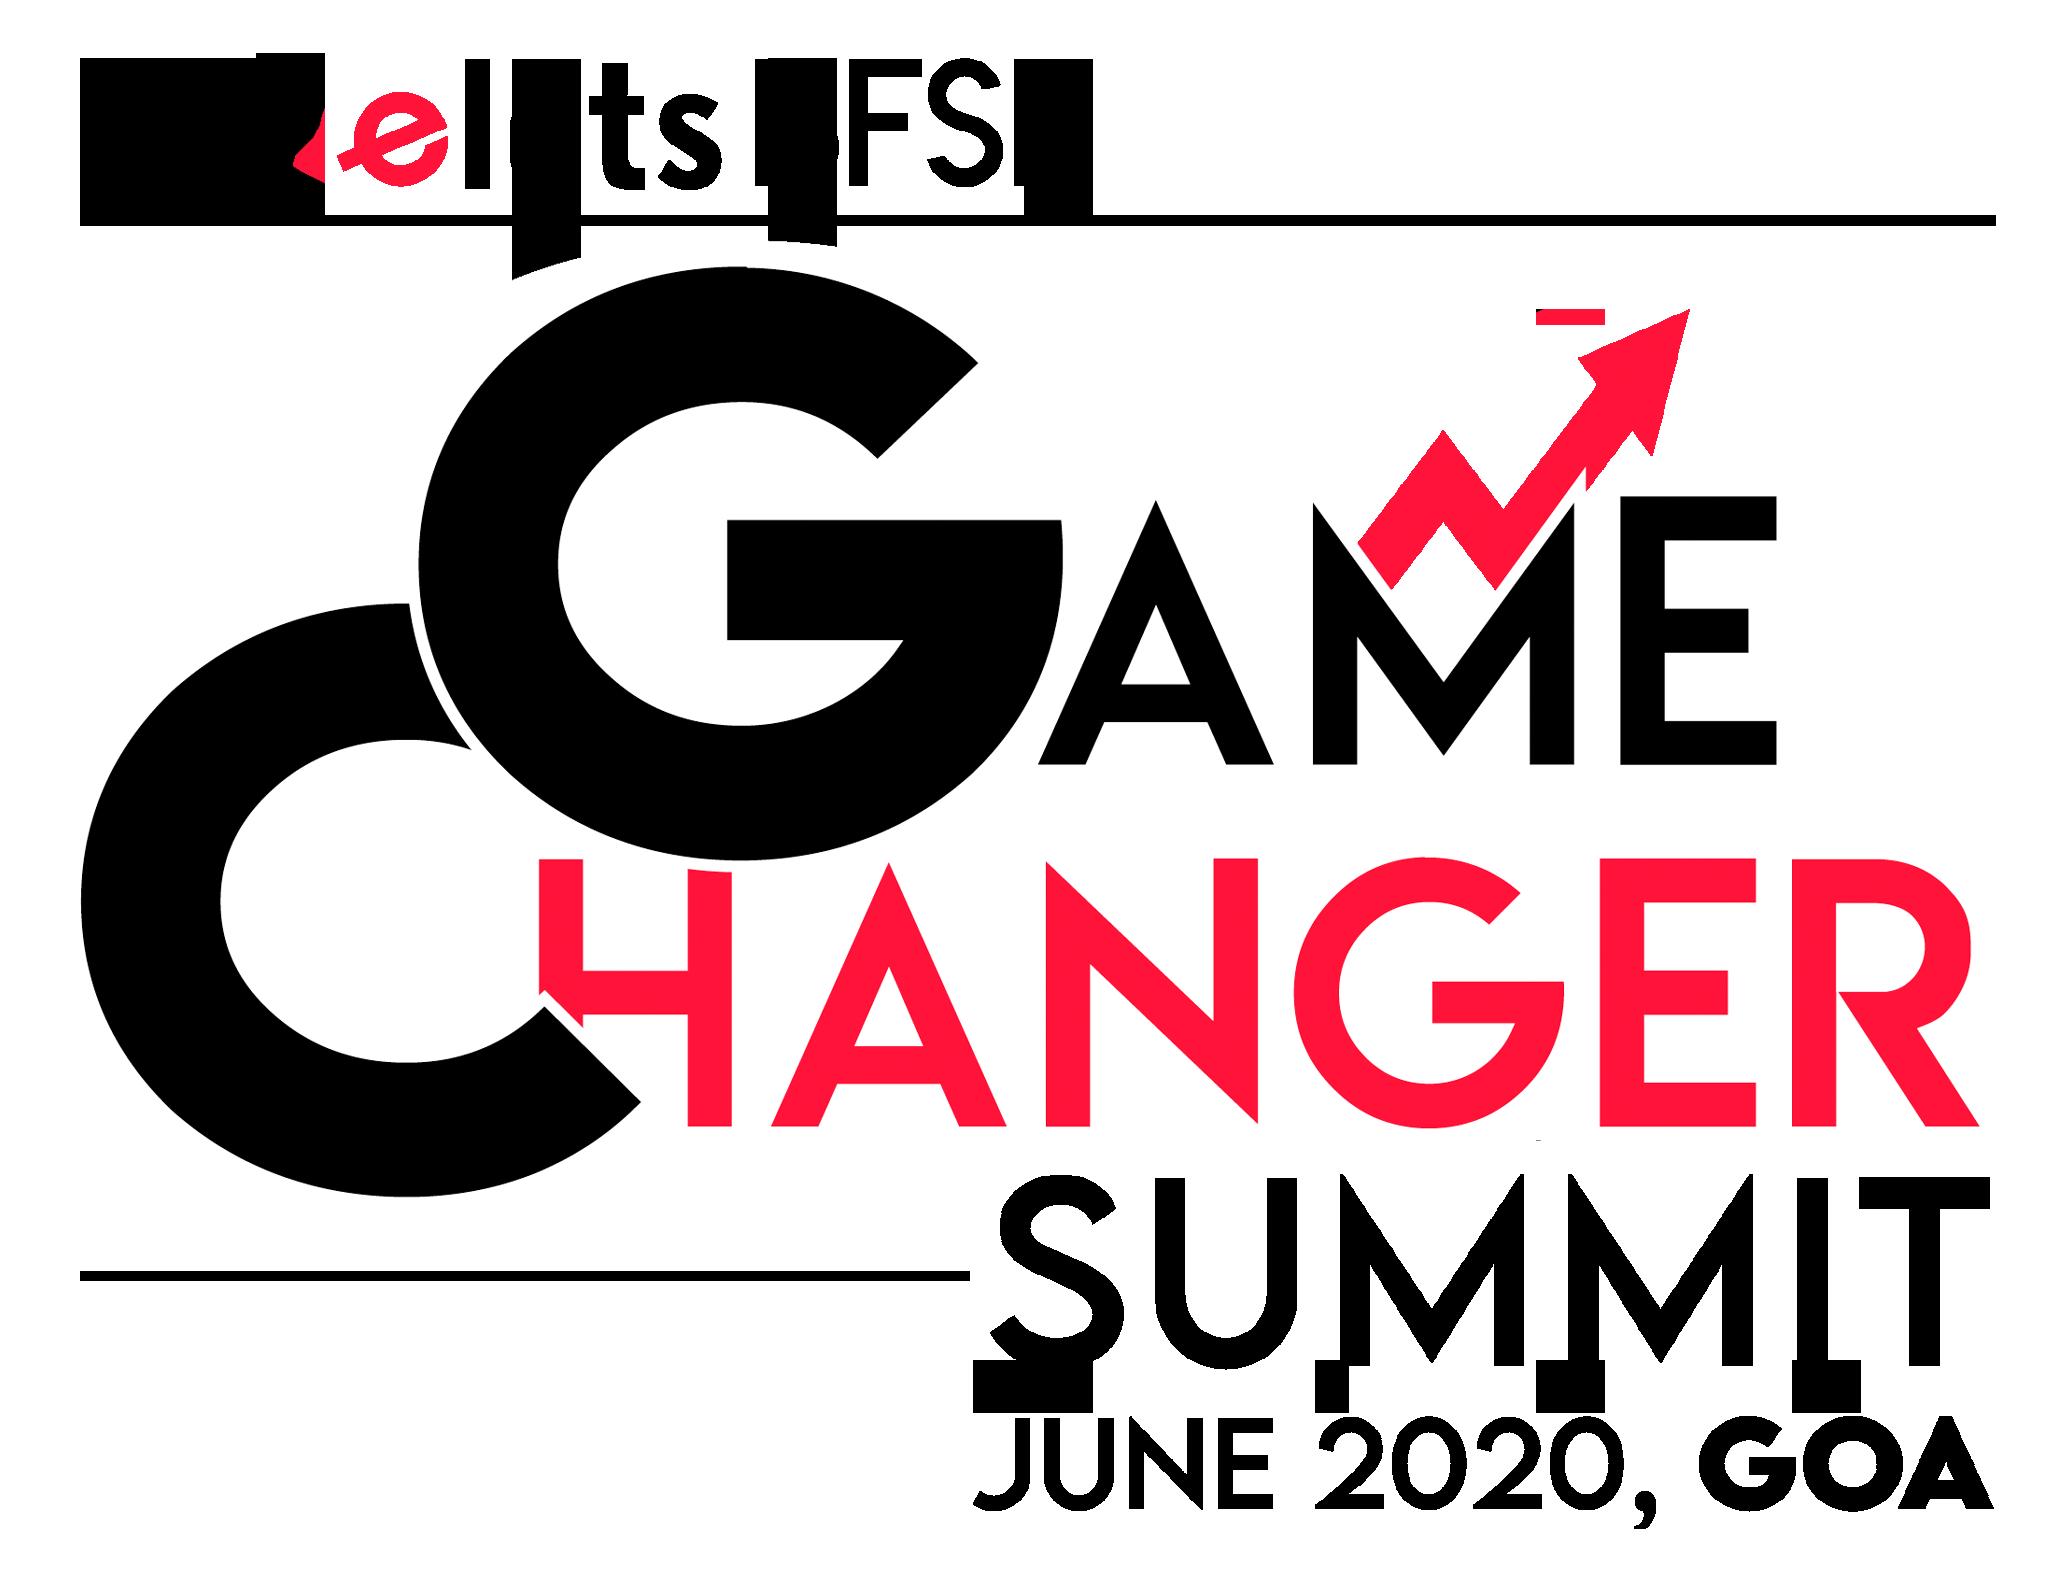 2nd BFSI Gamechanger Summit, Goa